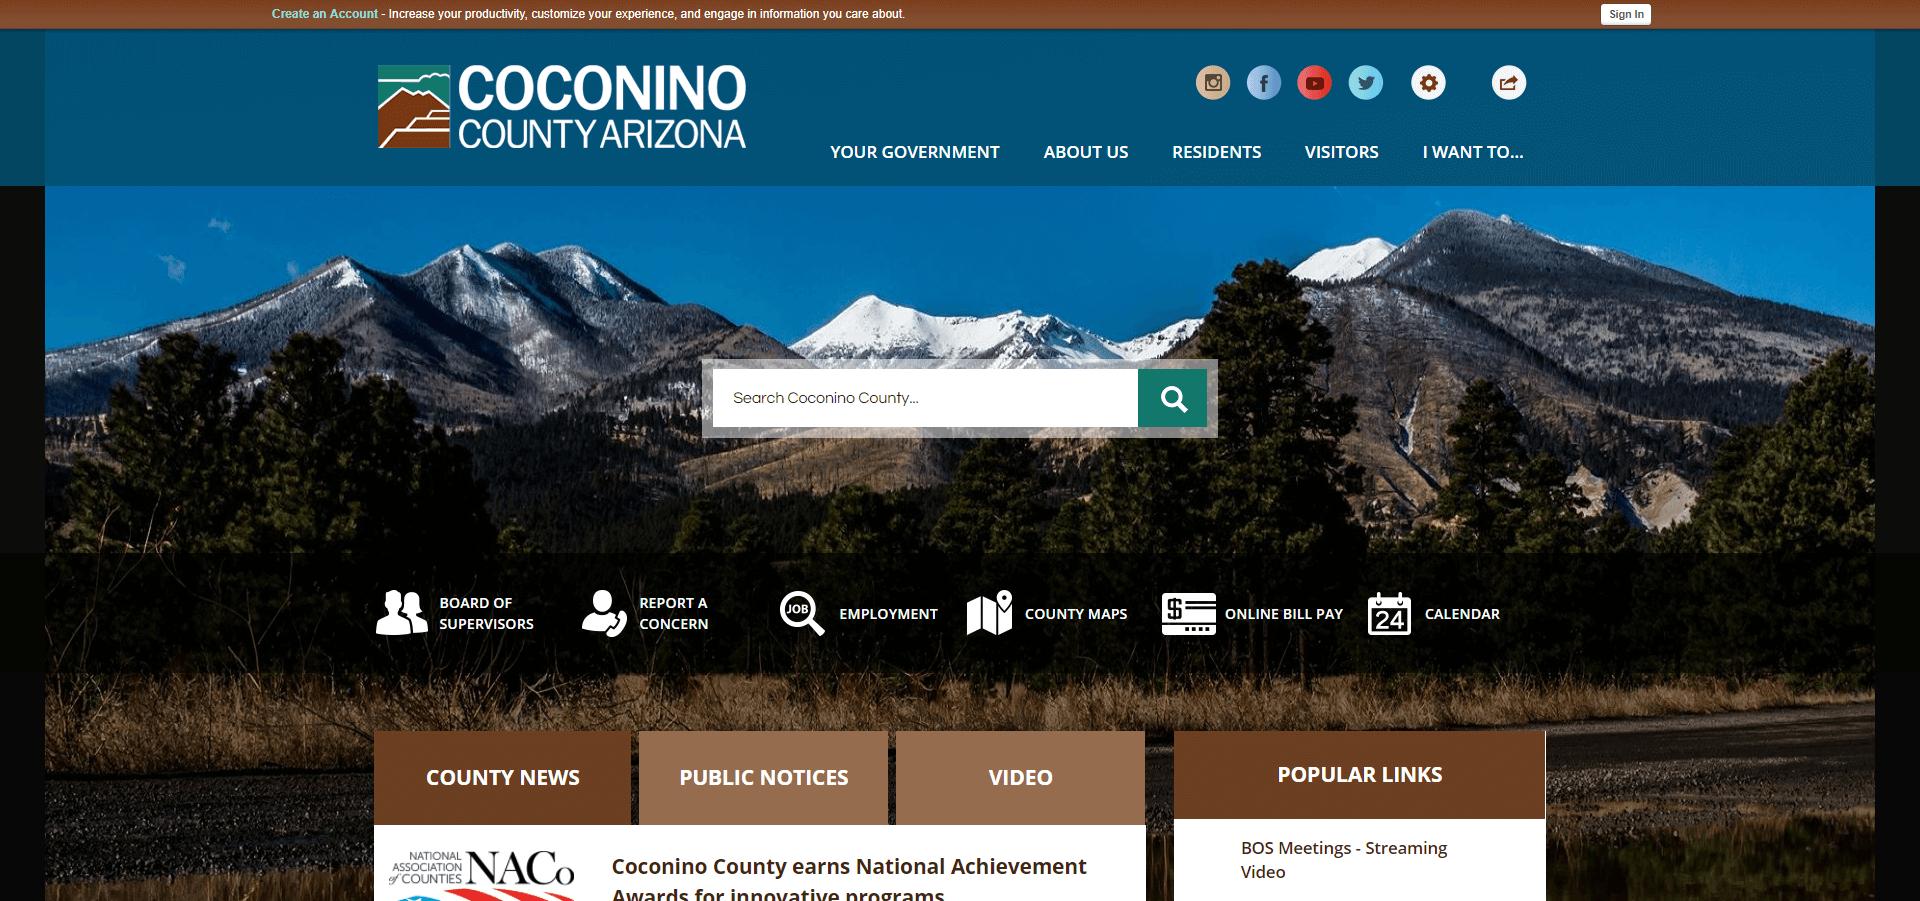 2016_Digital_Counties_Survey_Winner_Cococino_County_AZ.png